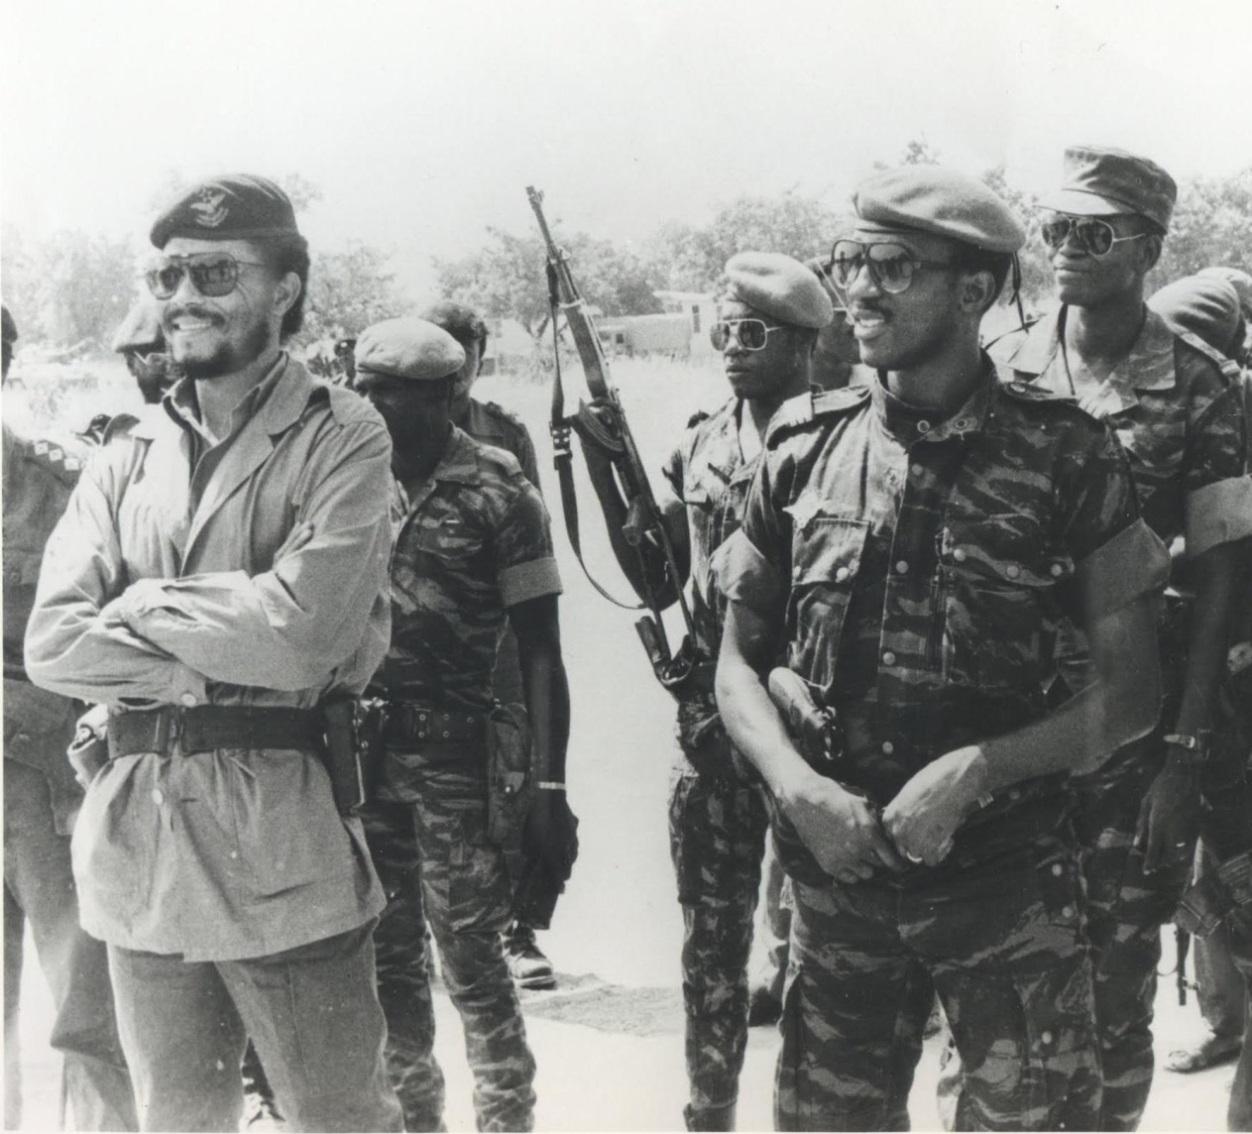 Image d'archives : Thomas Sankara, ancien président du Burkina Faso.